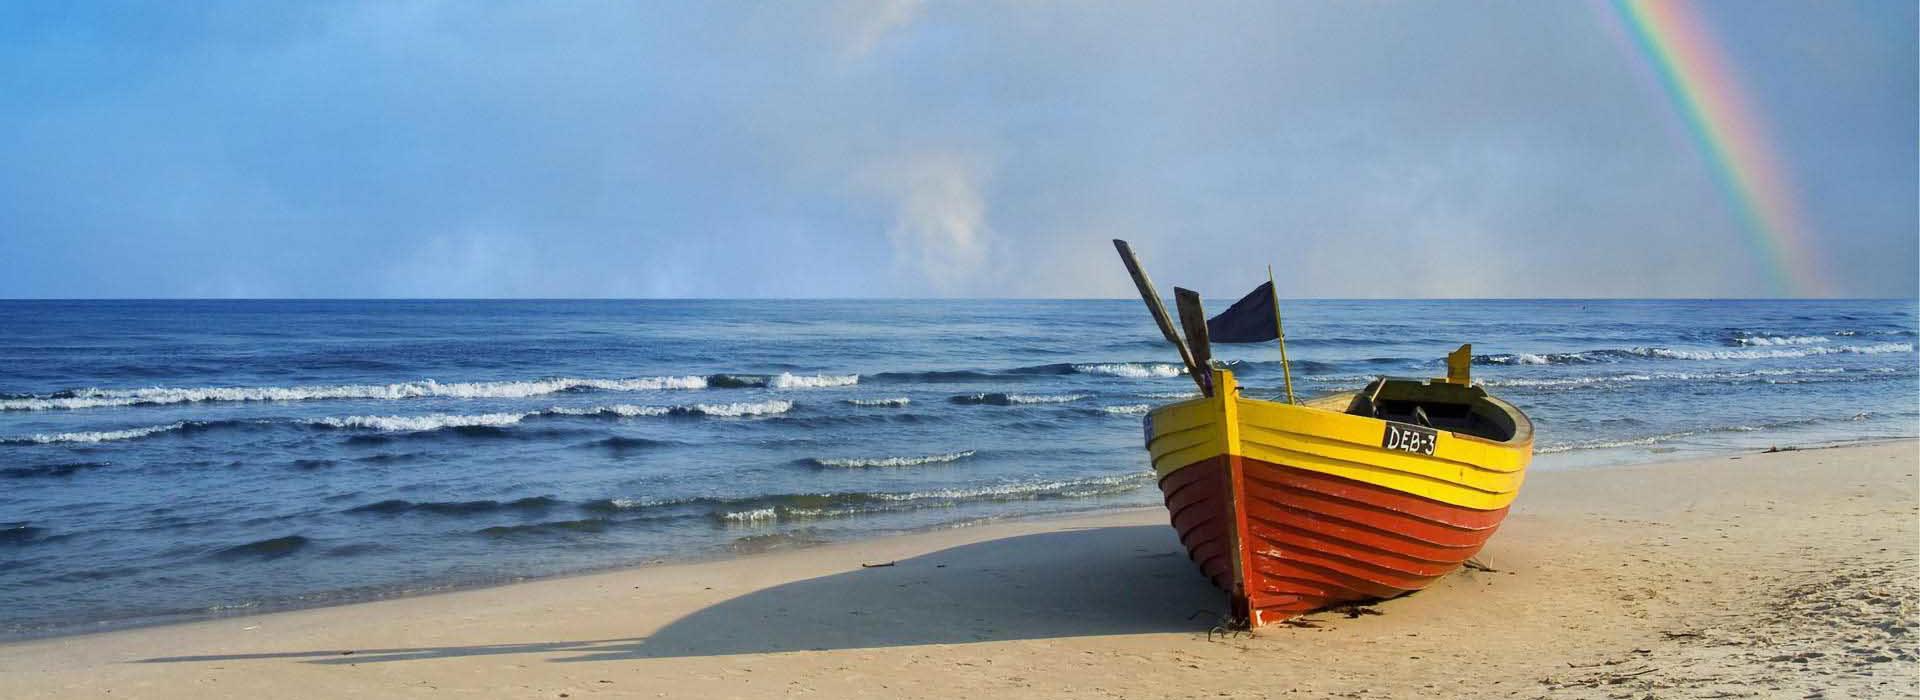 spiaggia barca e arcobaleno